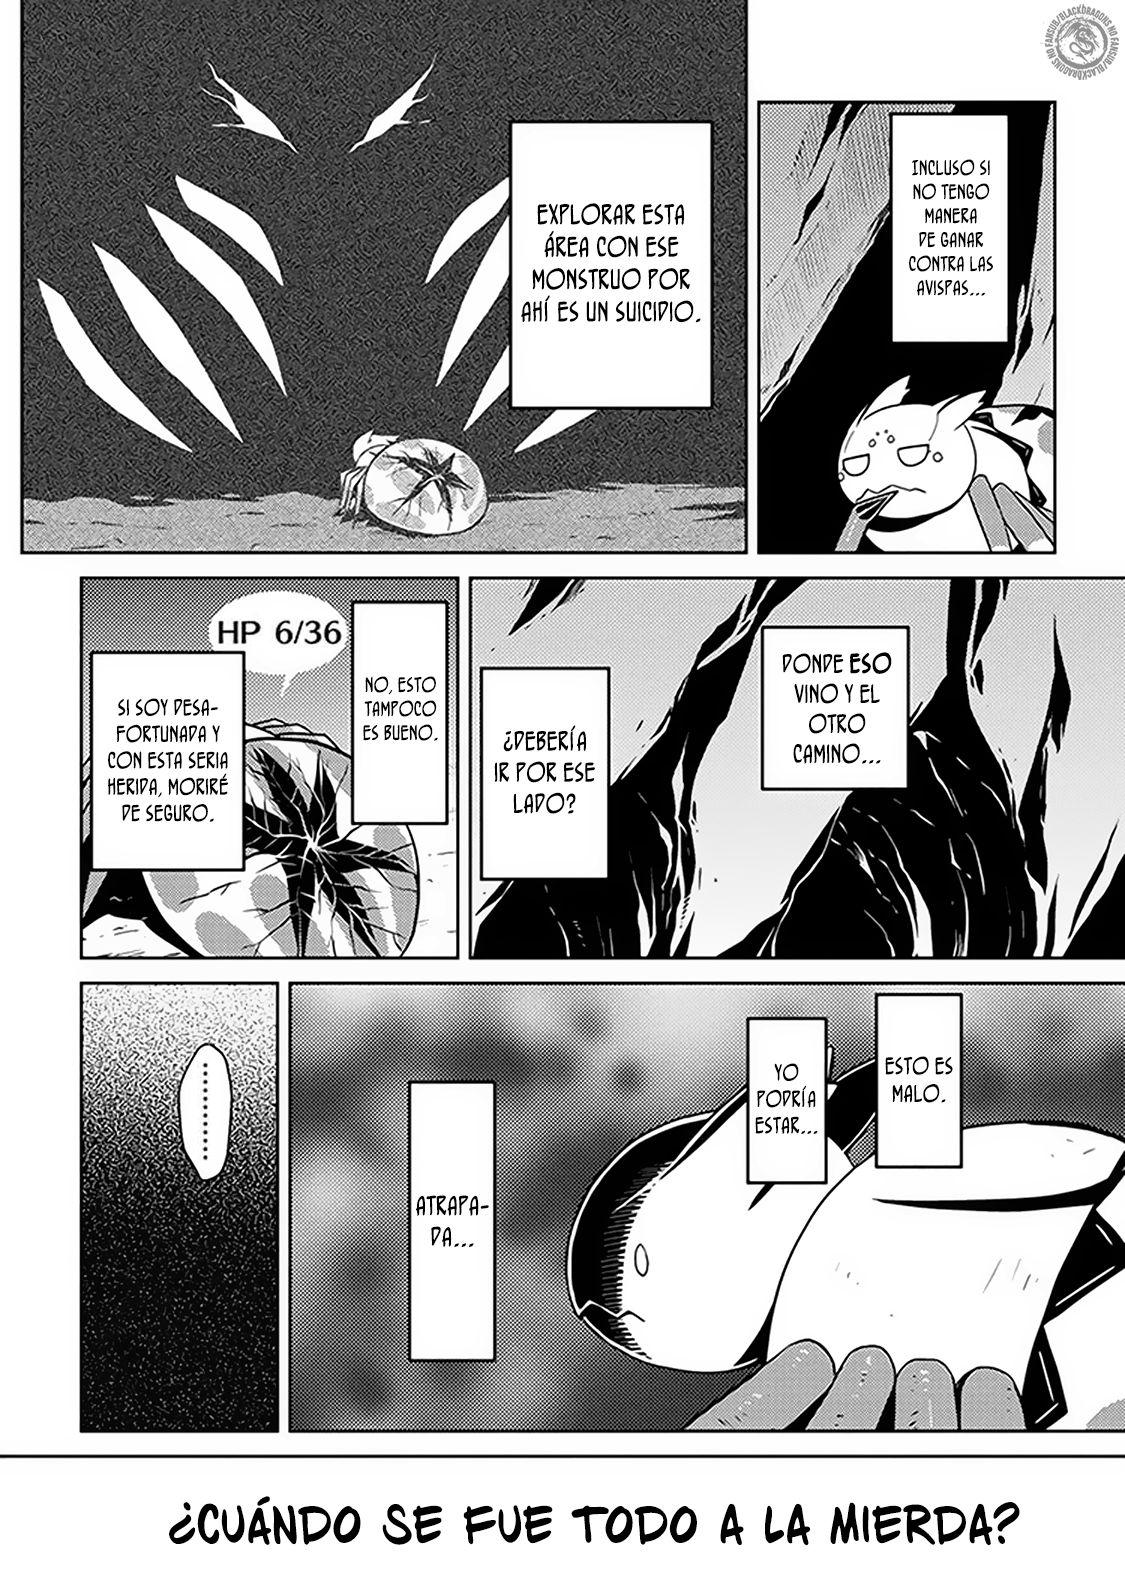 http://c5.ninemanga.com/es_manga/59/18683/485702/f666d0fa7bc89cd31aaaa23352cbbb96.jpg Page 7